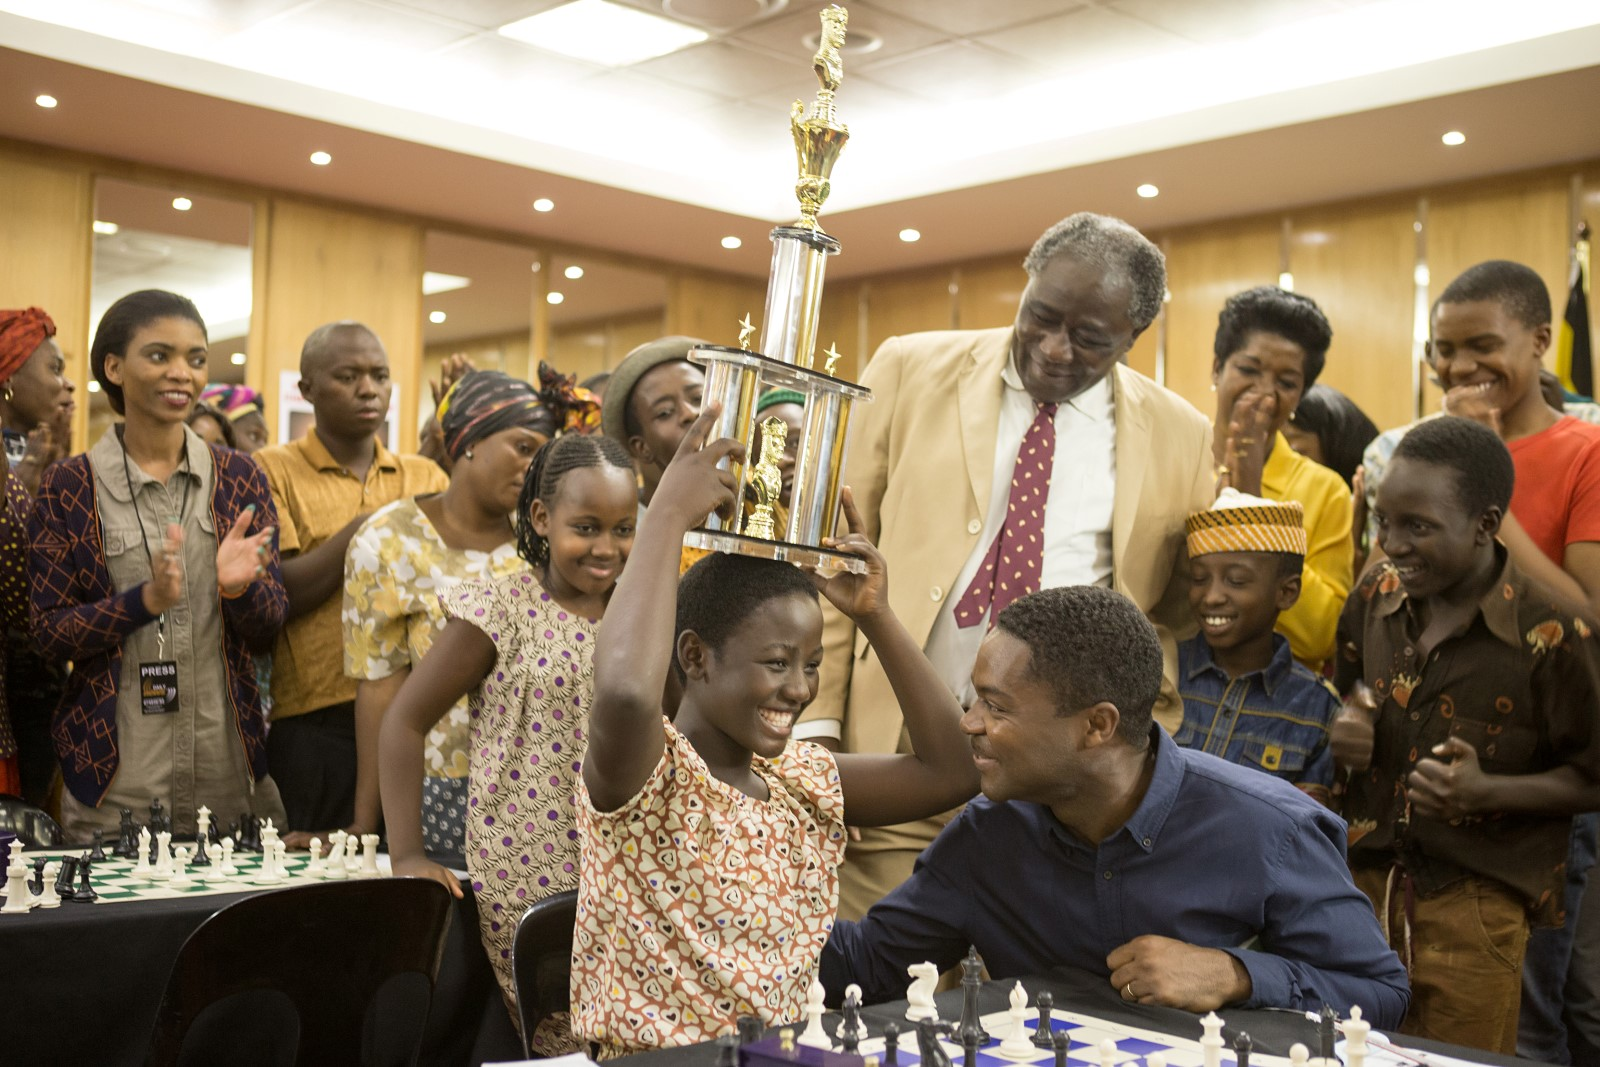 David Oyelowo is Robert Katende and Madina Nalwanga plays young Phiona Mutesi.